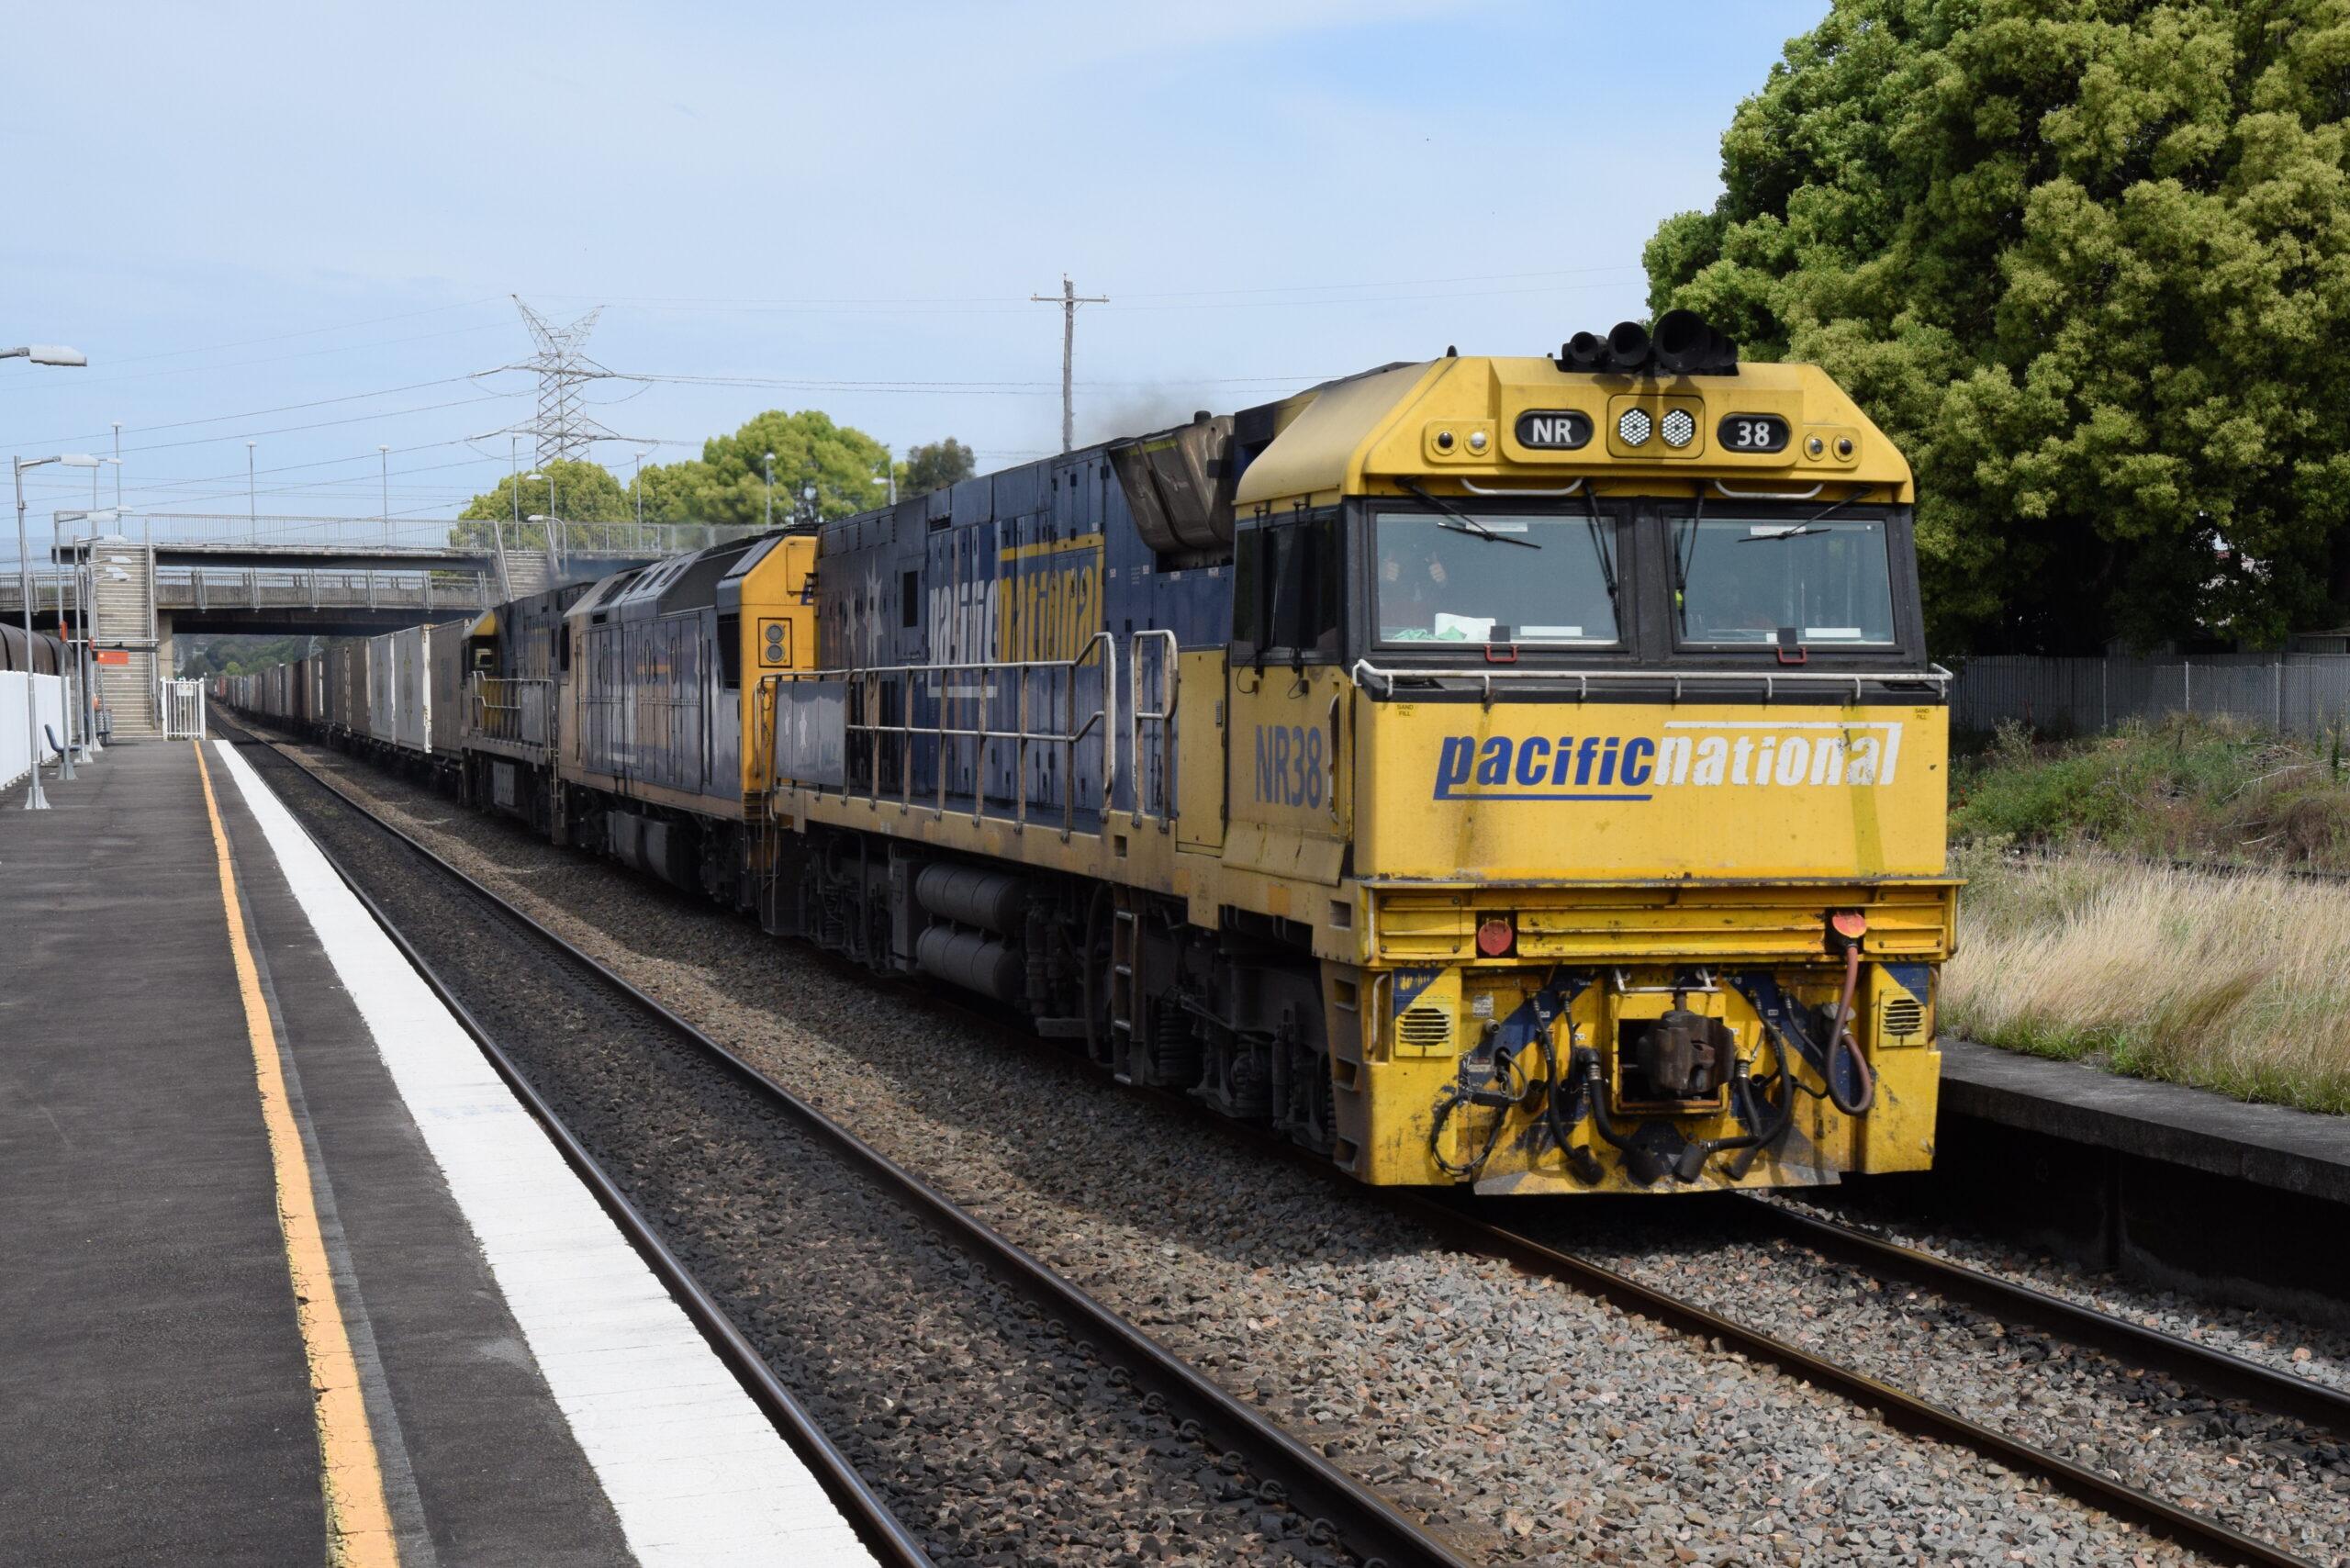 Freight train heading to Port Botany, Sydney